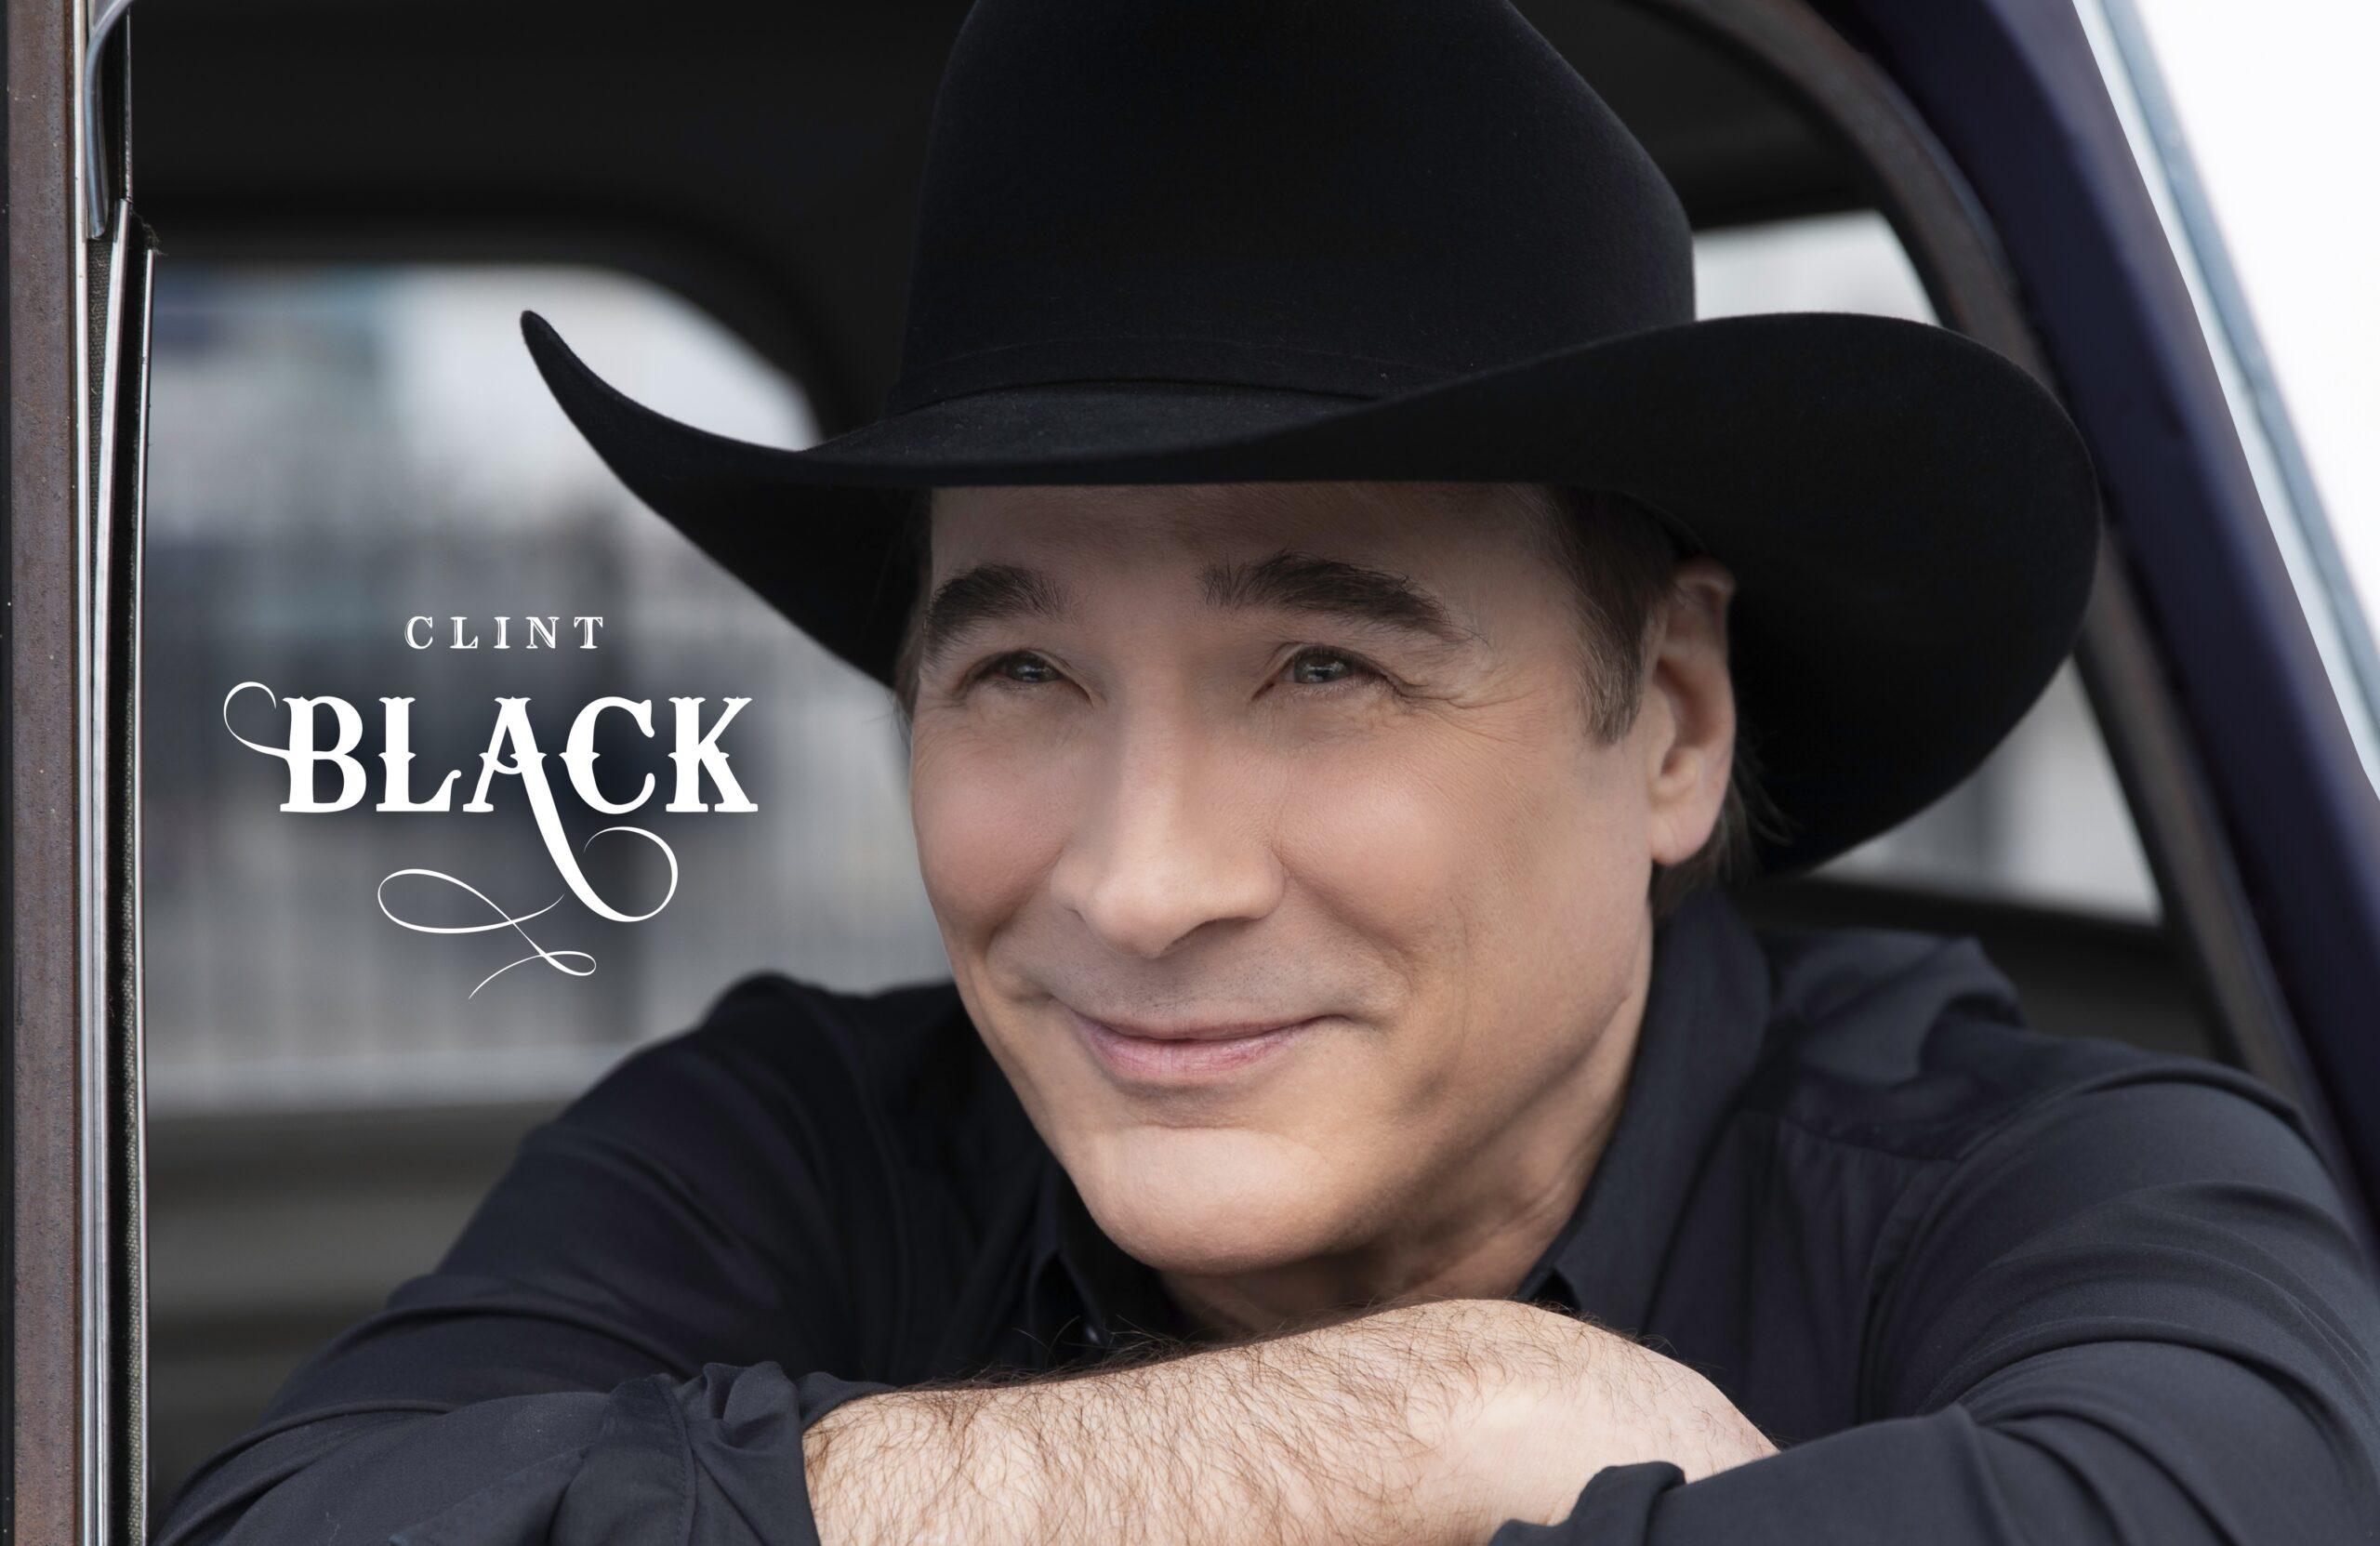 Clint-Black-scaled